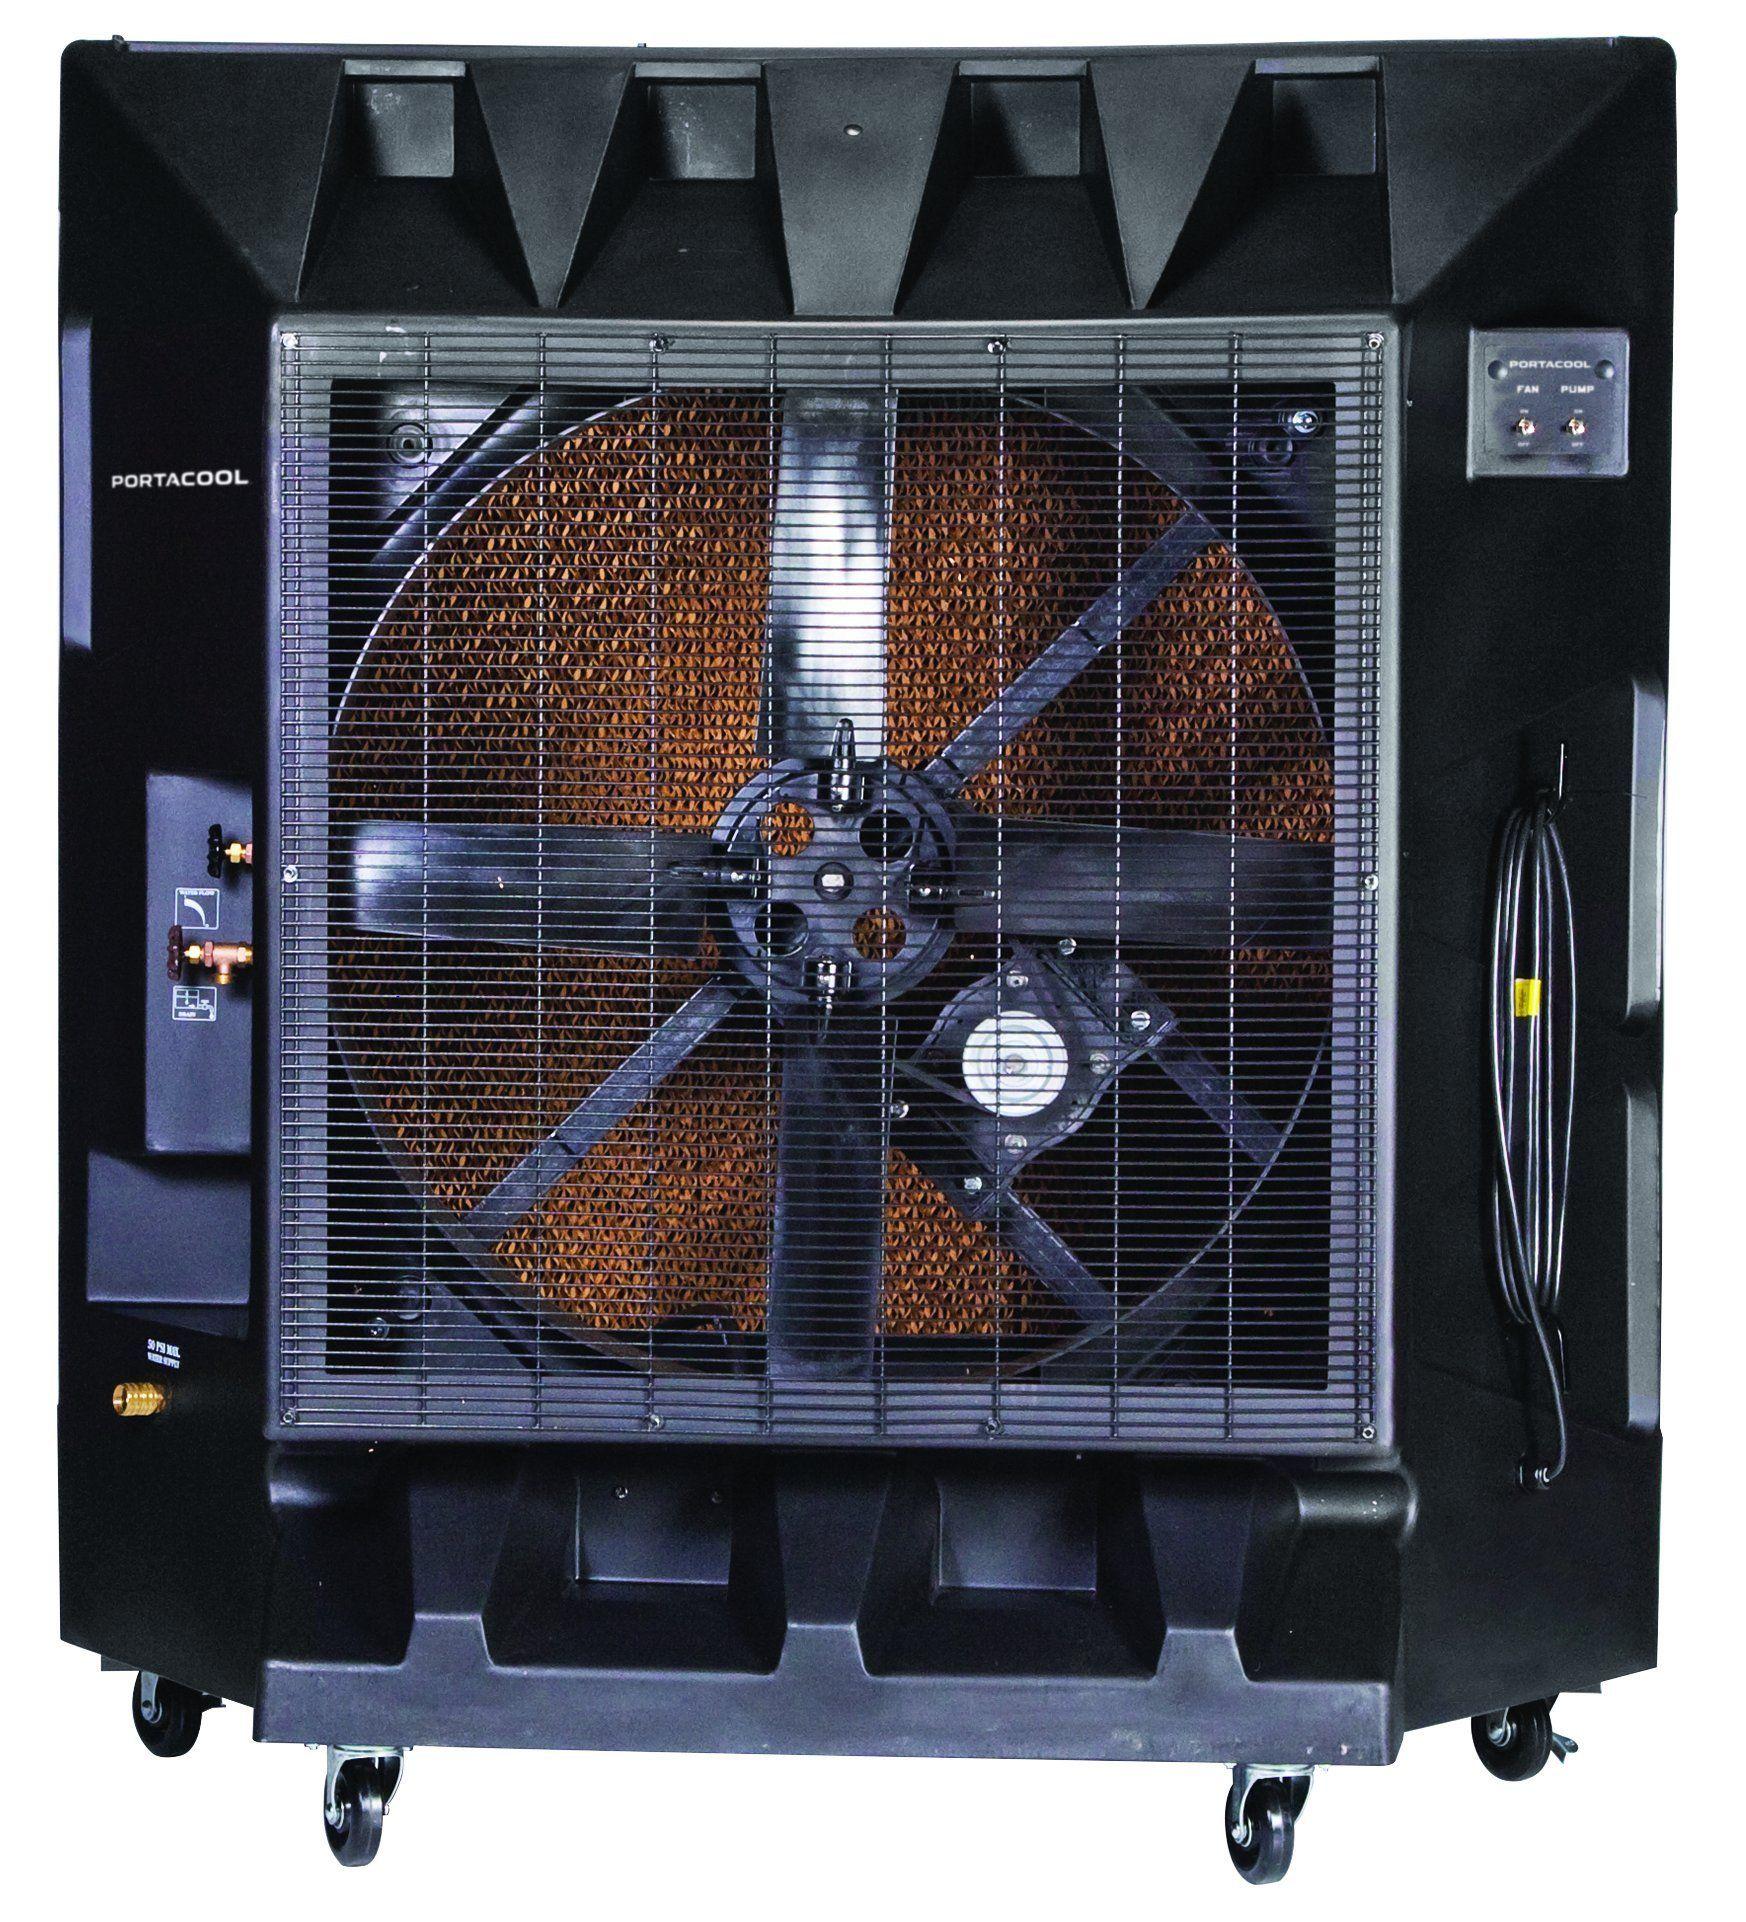 Avalanche 3600 CFM Evaporative Cooler Evaporative cooler